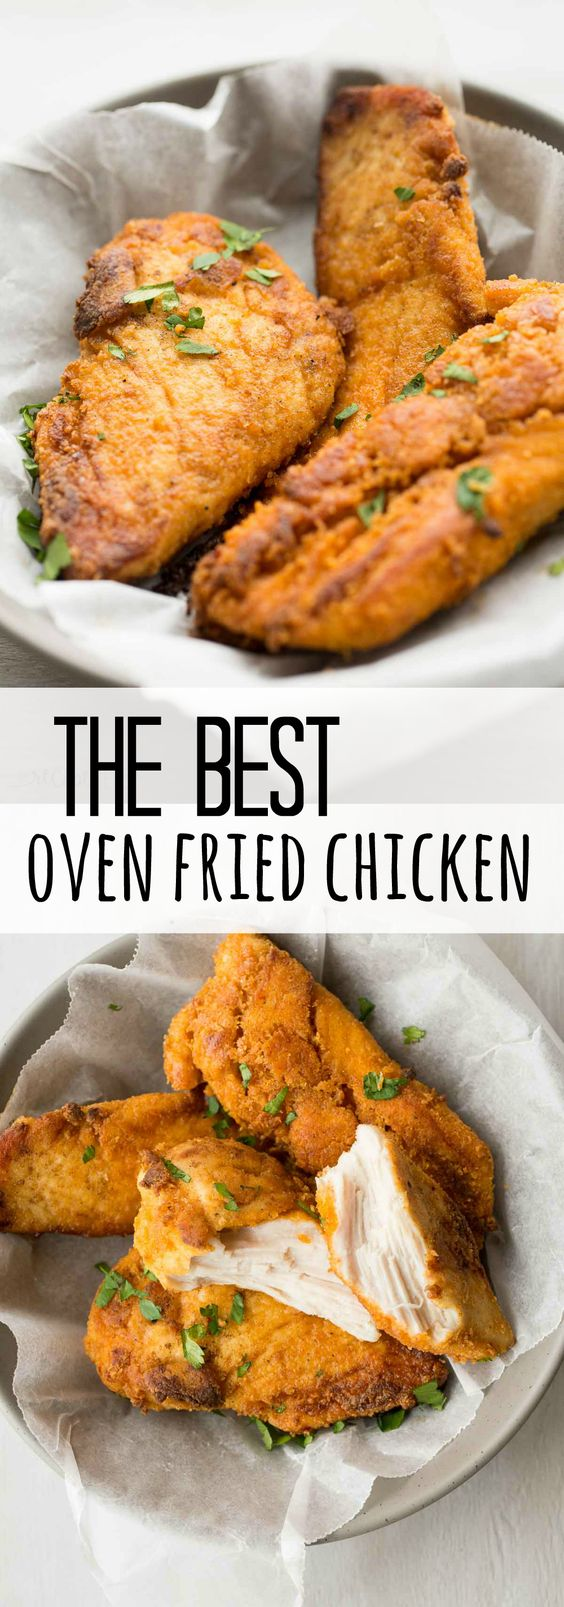 Baked Chicken Recipes Drumsticks Ovens